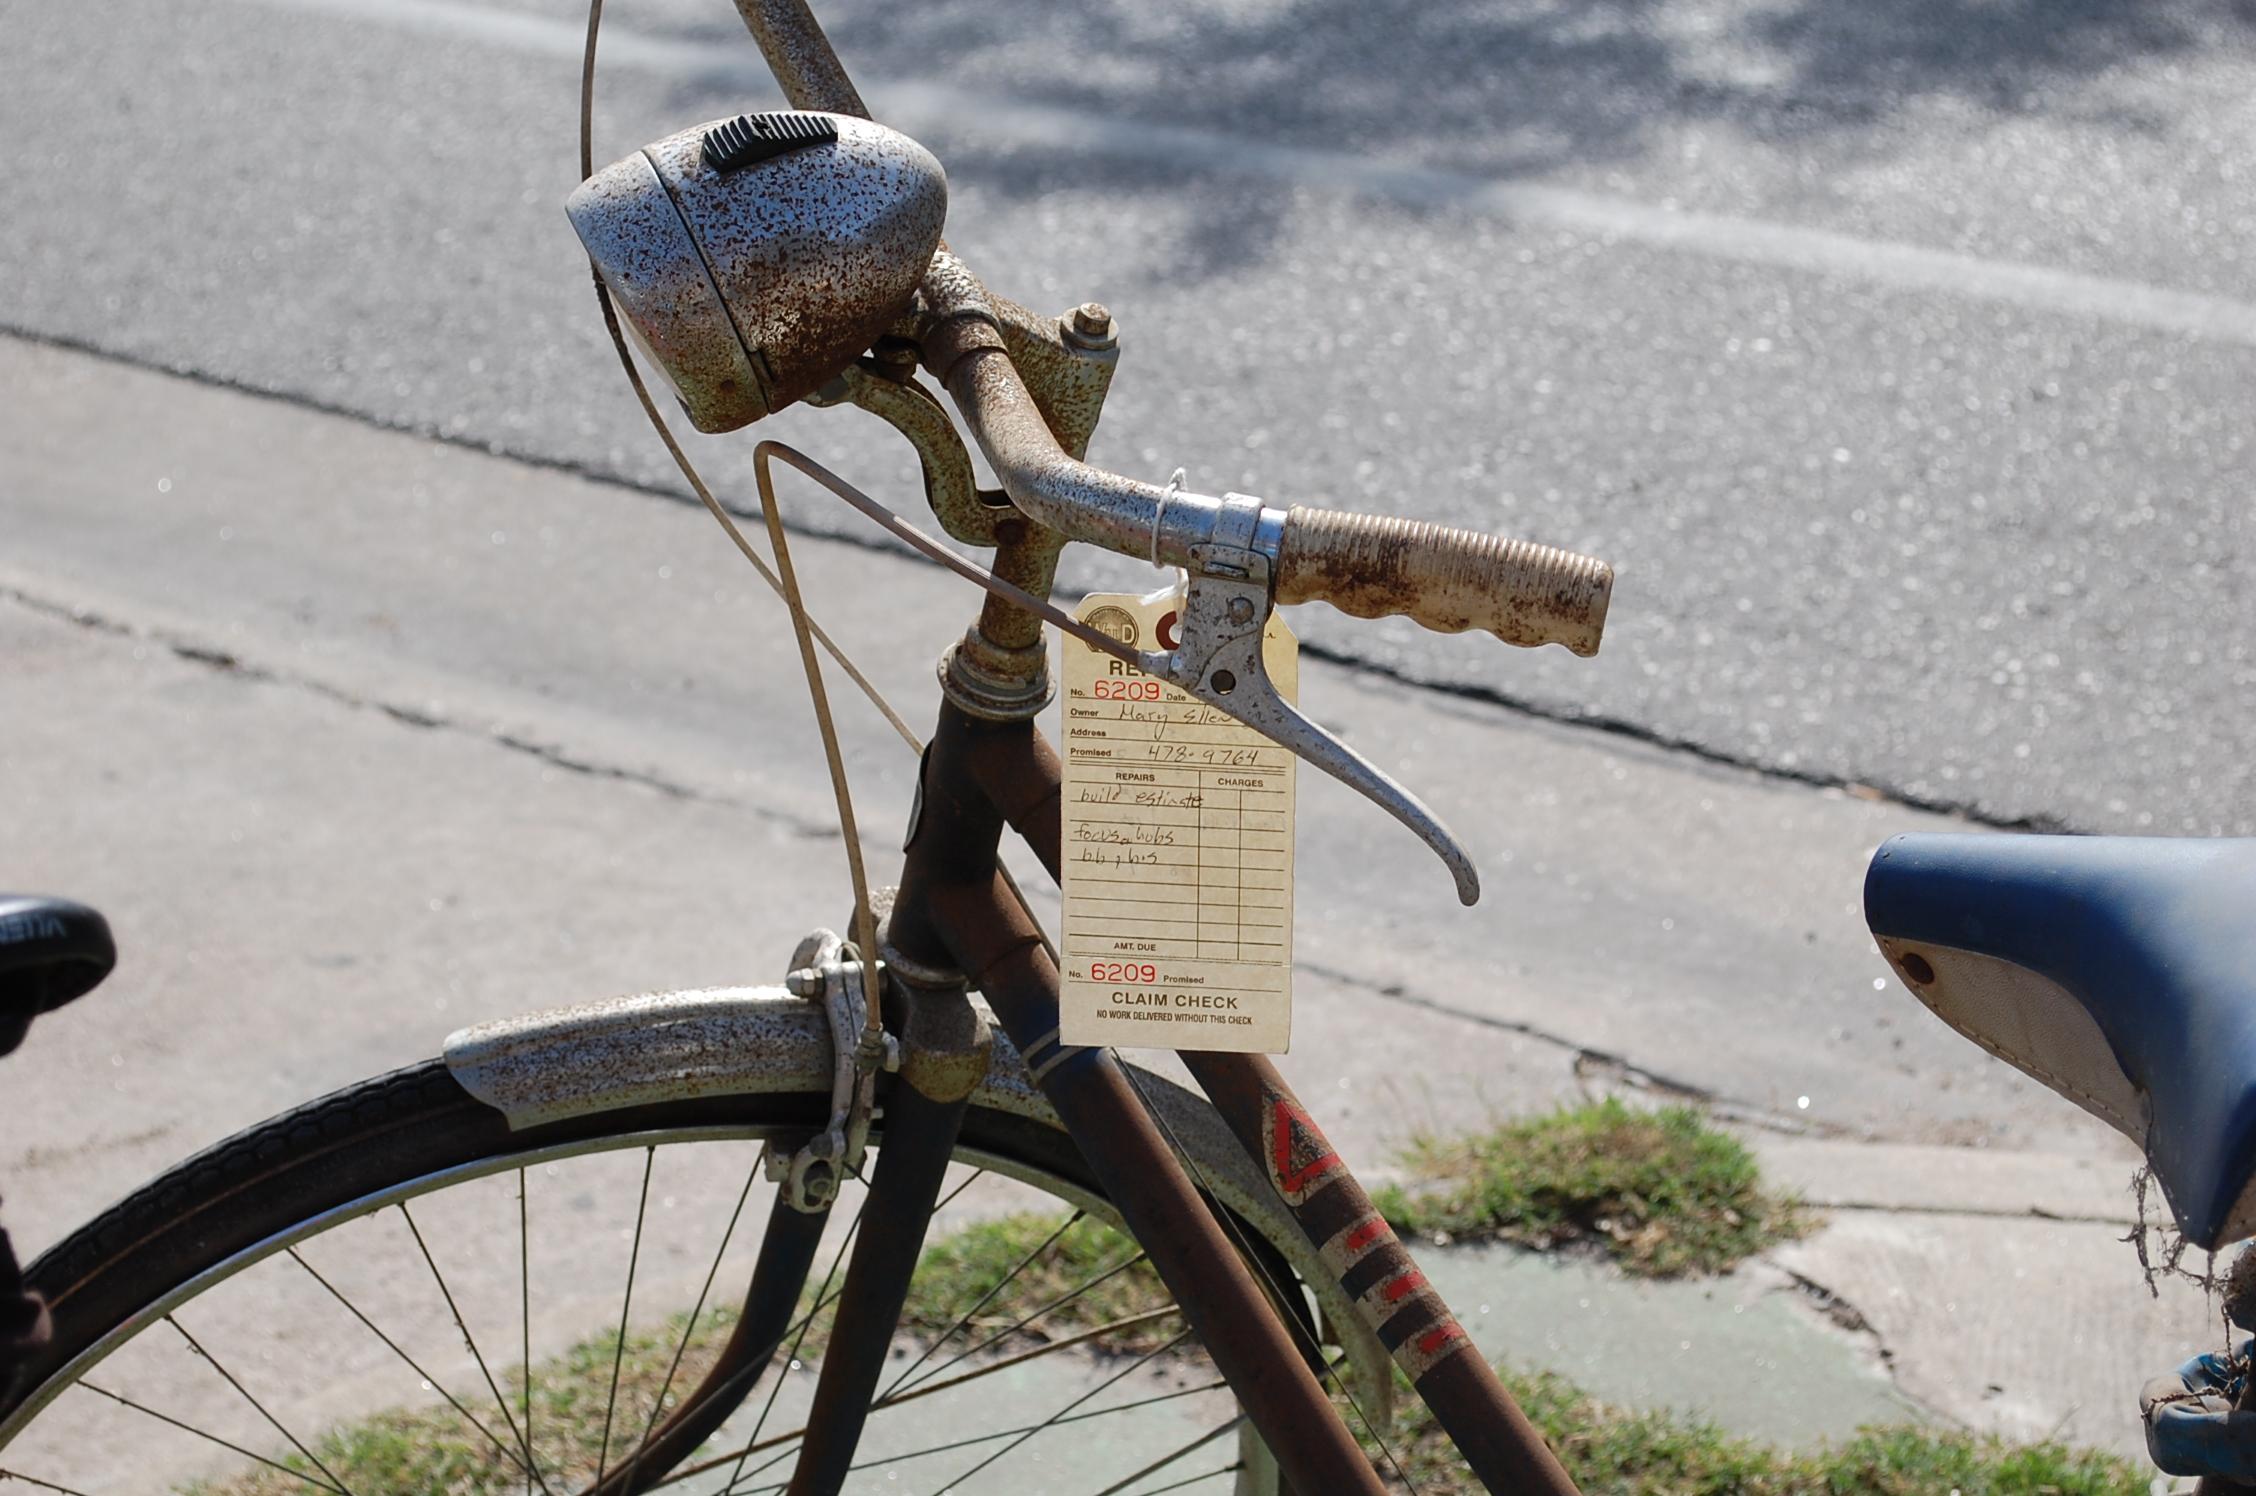 Rustic Retro Bike, Bicycle, Bike, Old, Retro, HQ Photo